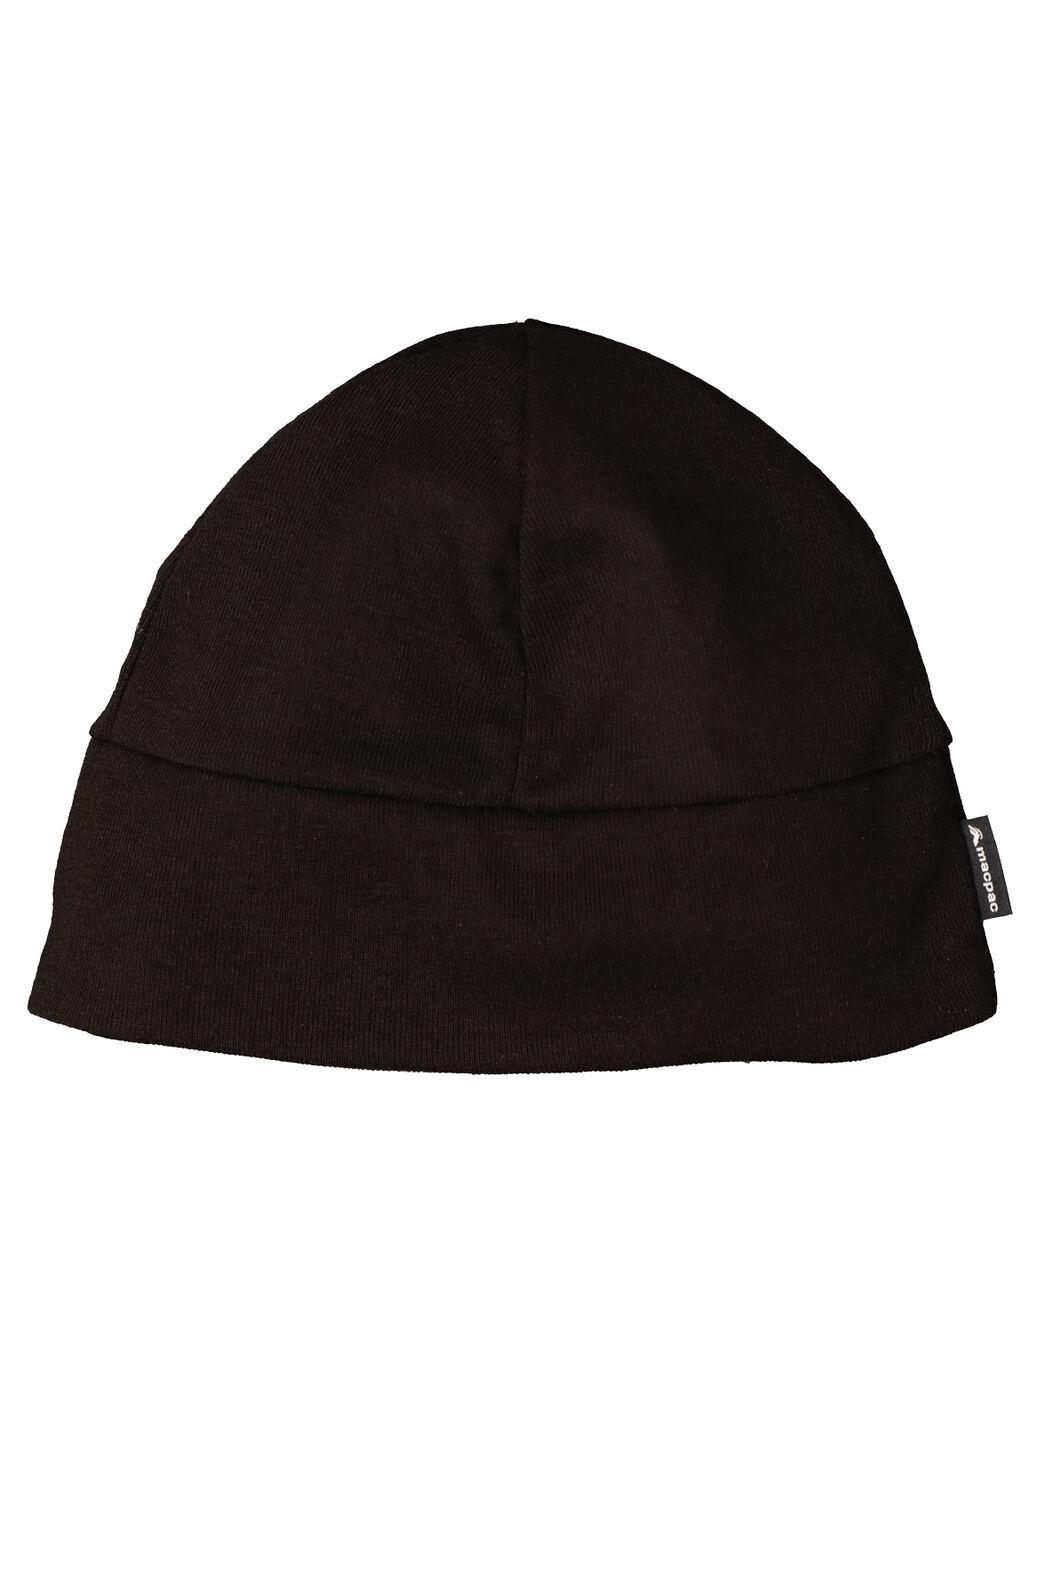 Macpac Polypro Beanie, Black, hi-res